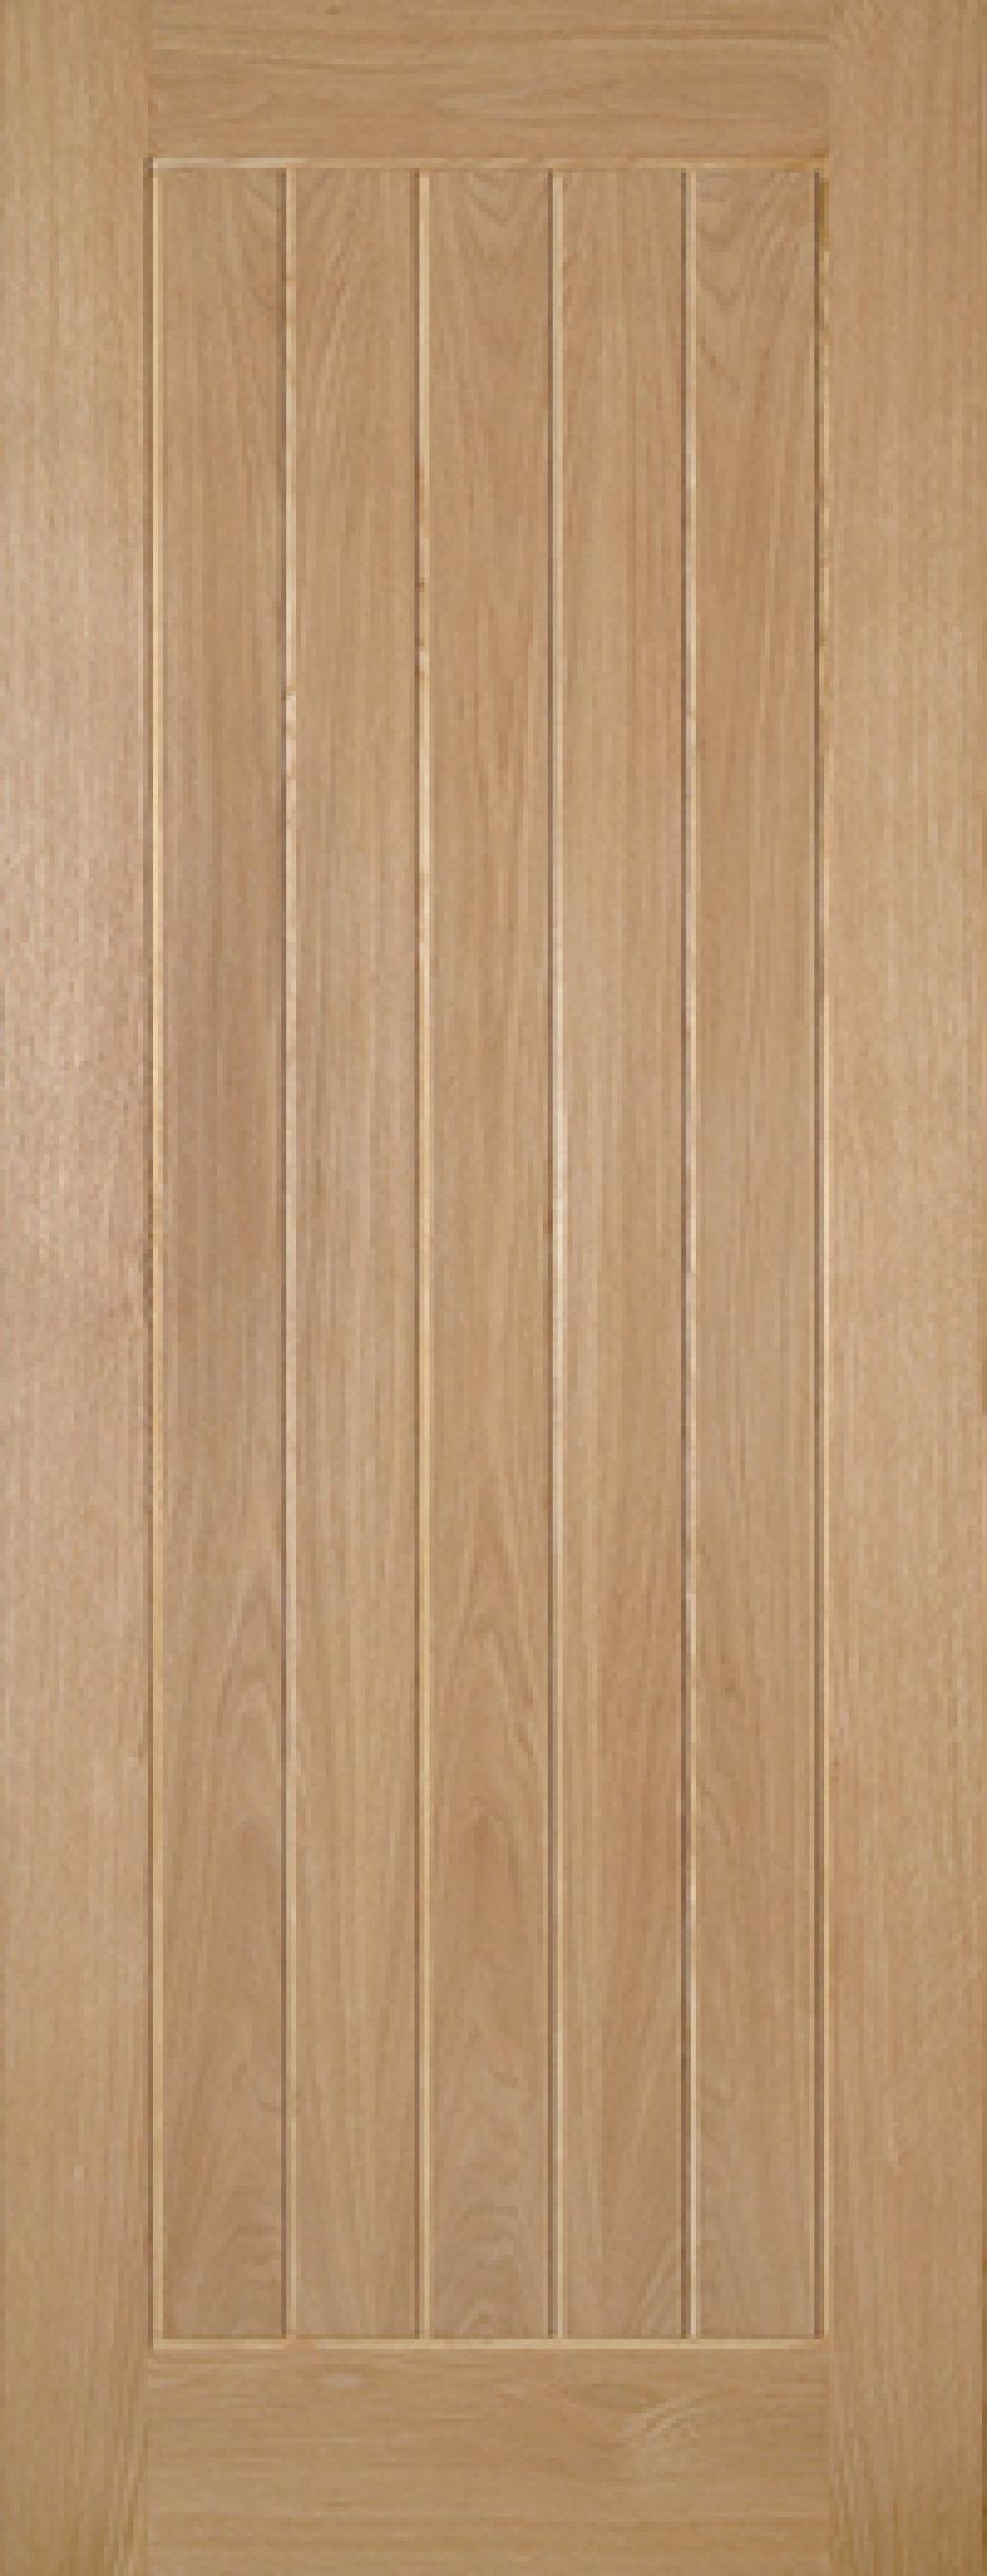 Ely Oak - Prefinished Image